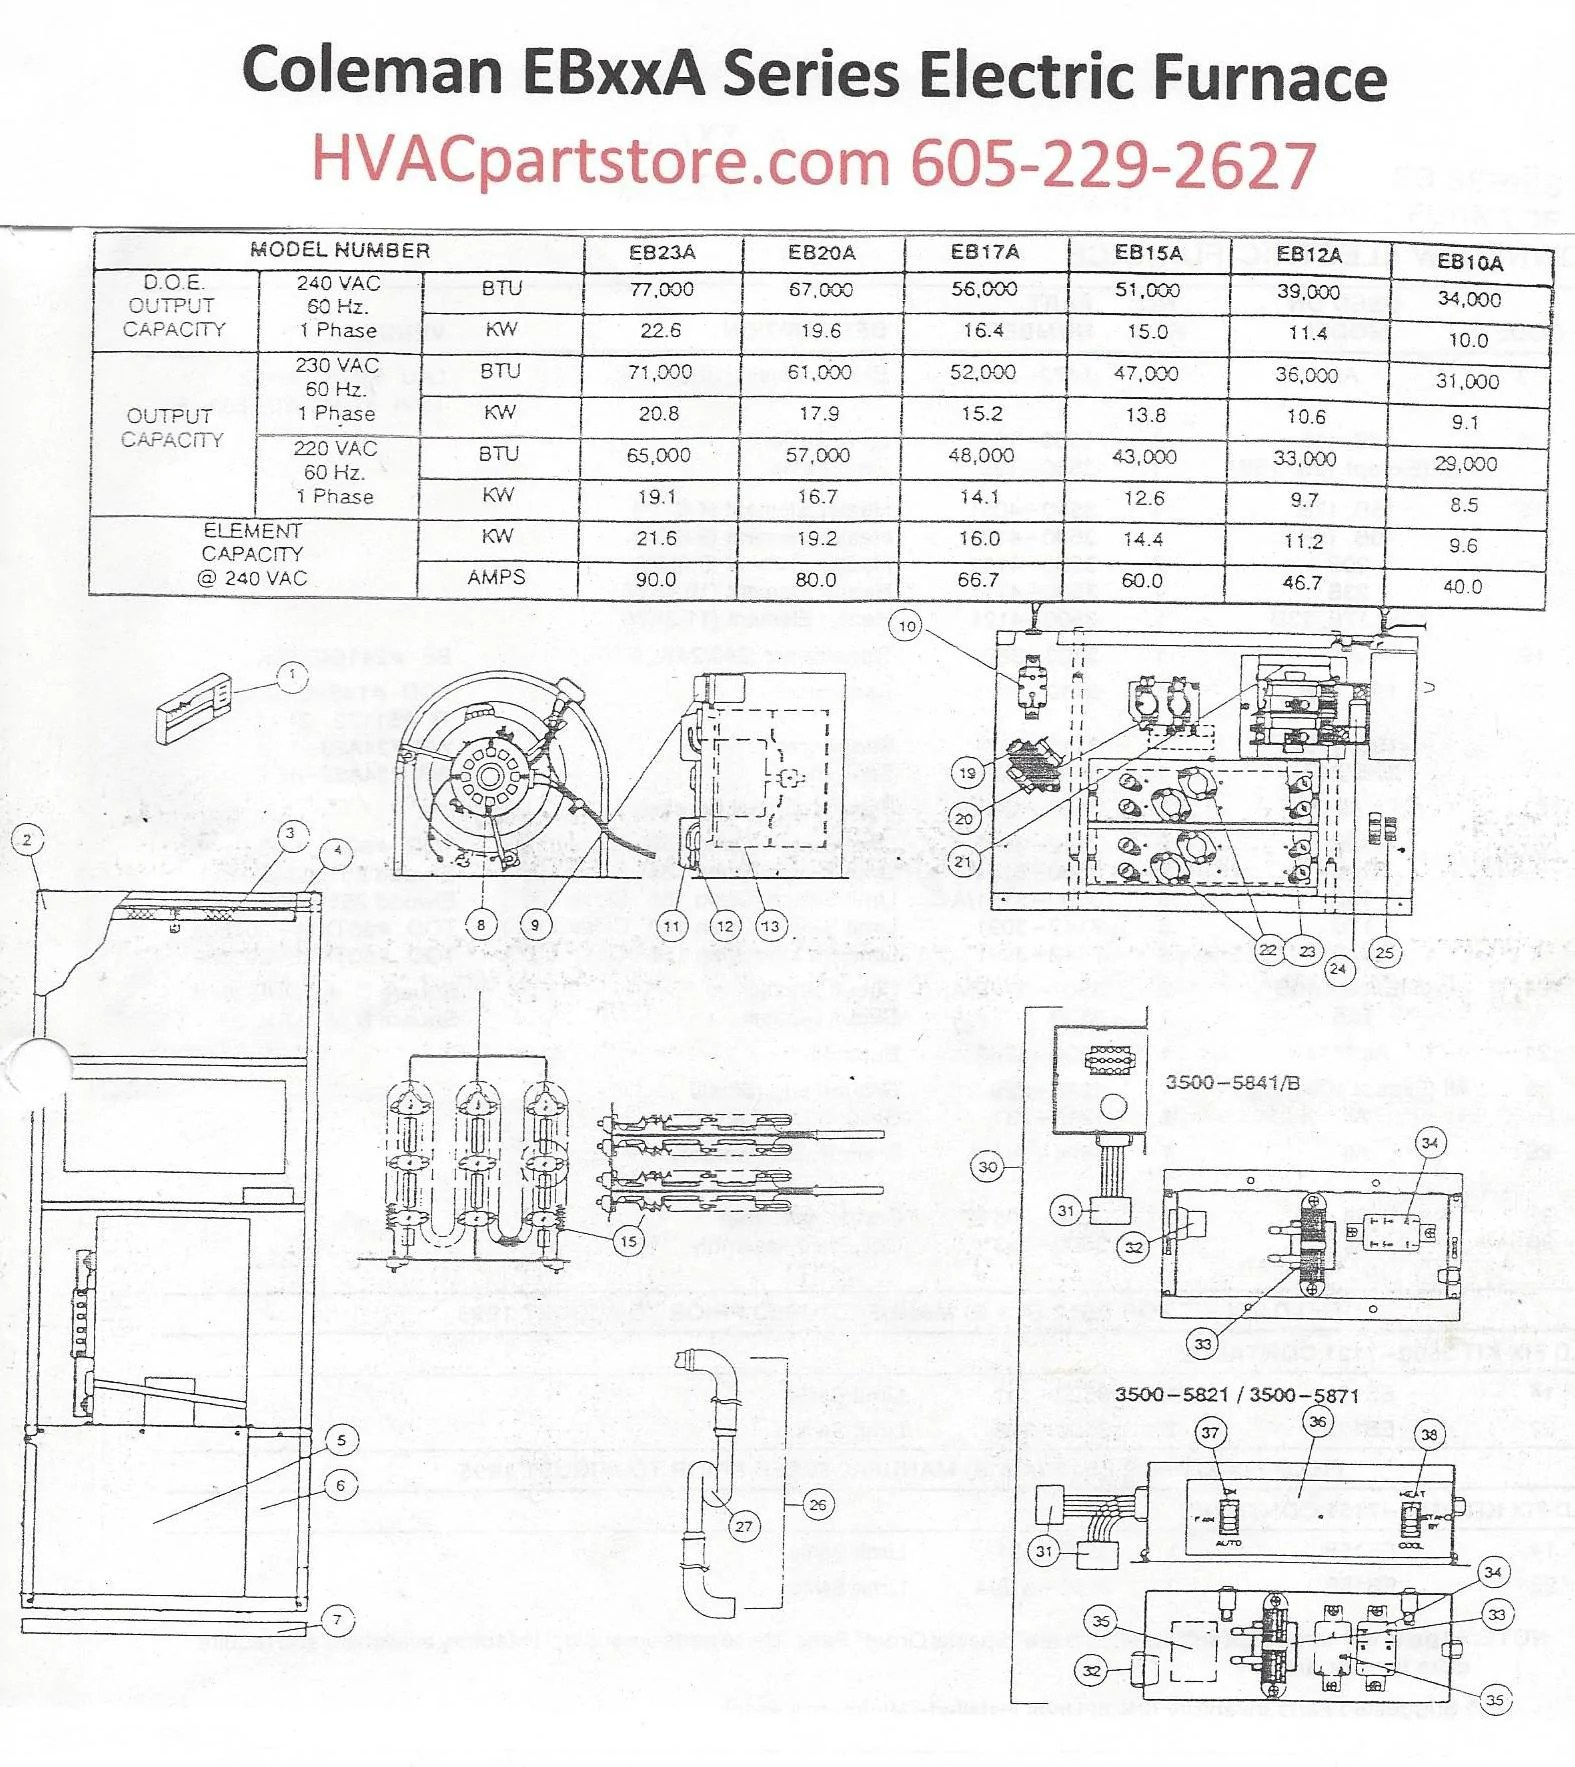 medium resolution of  6f60 4af3 9dea 1282aefef865 1786439620719197786 eb12a coleman electric furnace parts hvacpartstore electric furnace sequencer